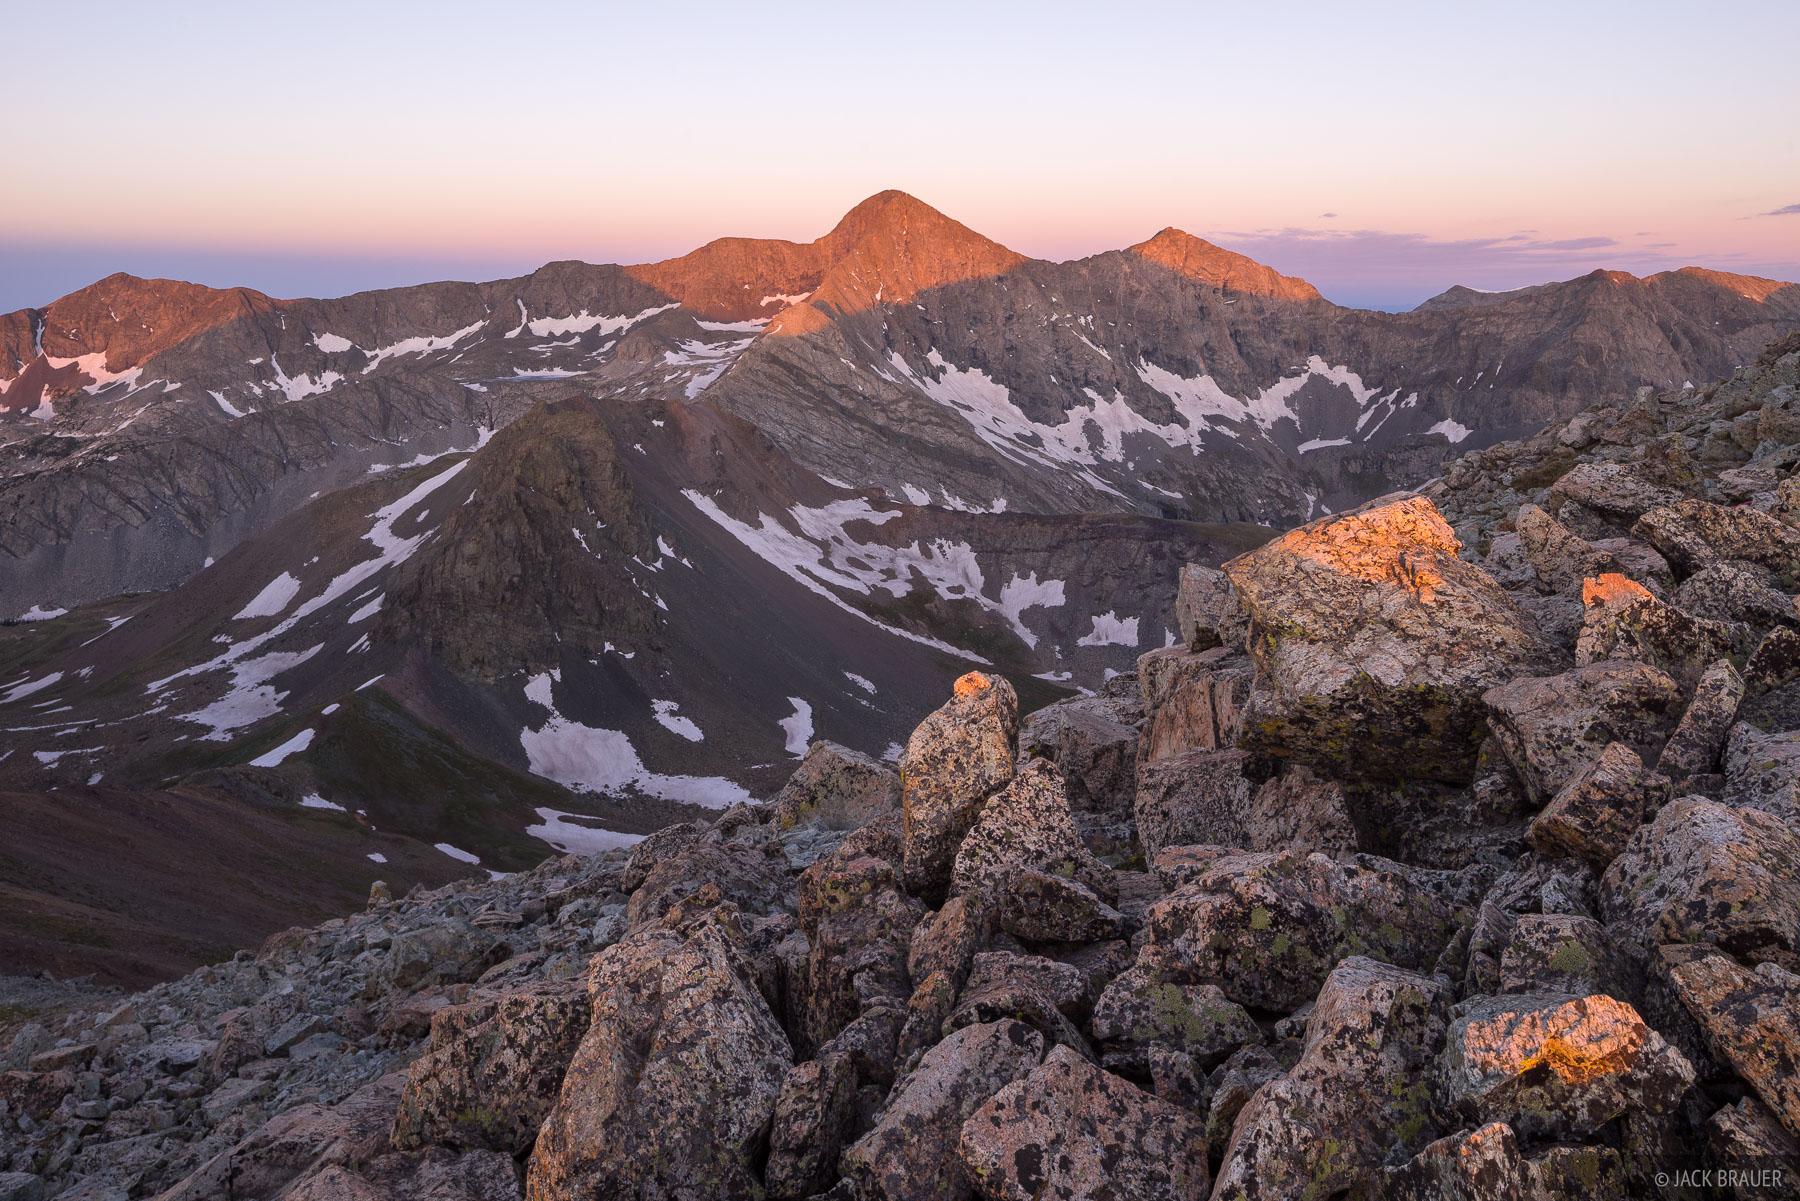 Blanca Peak,Colorado,Sangre de Cristos, fourteener, sunrise, photo